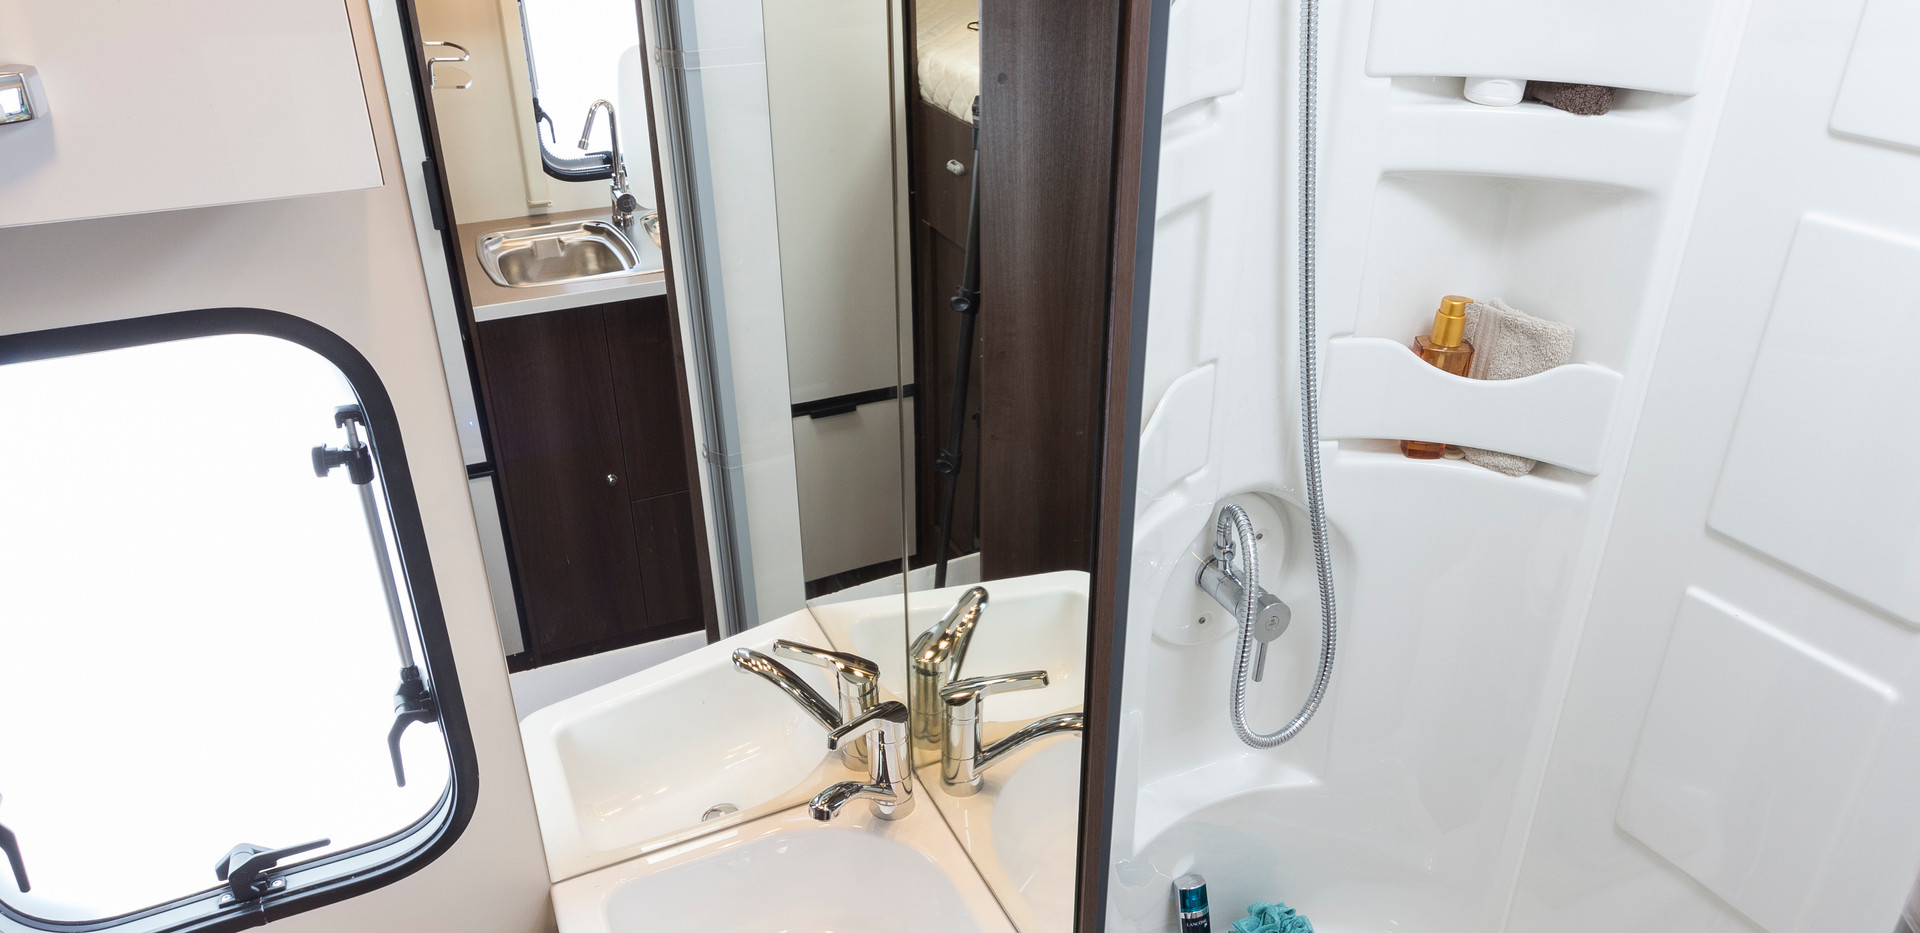 Zefiro 675_washroom and shower.JPG